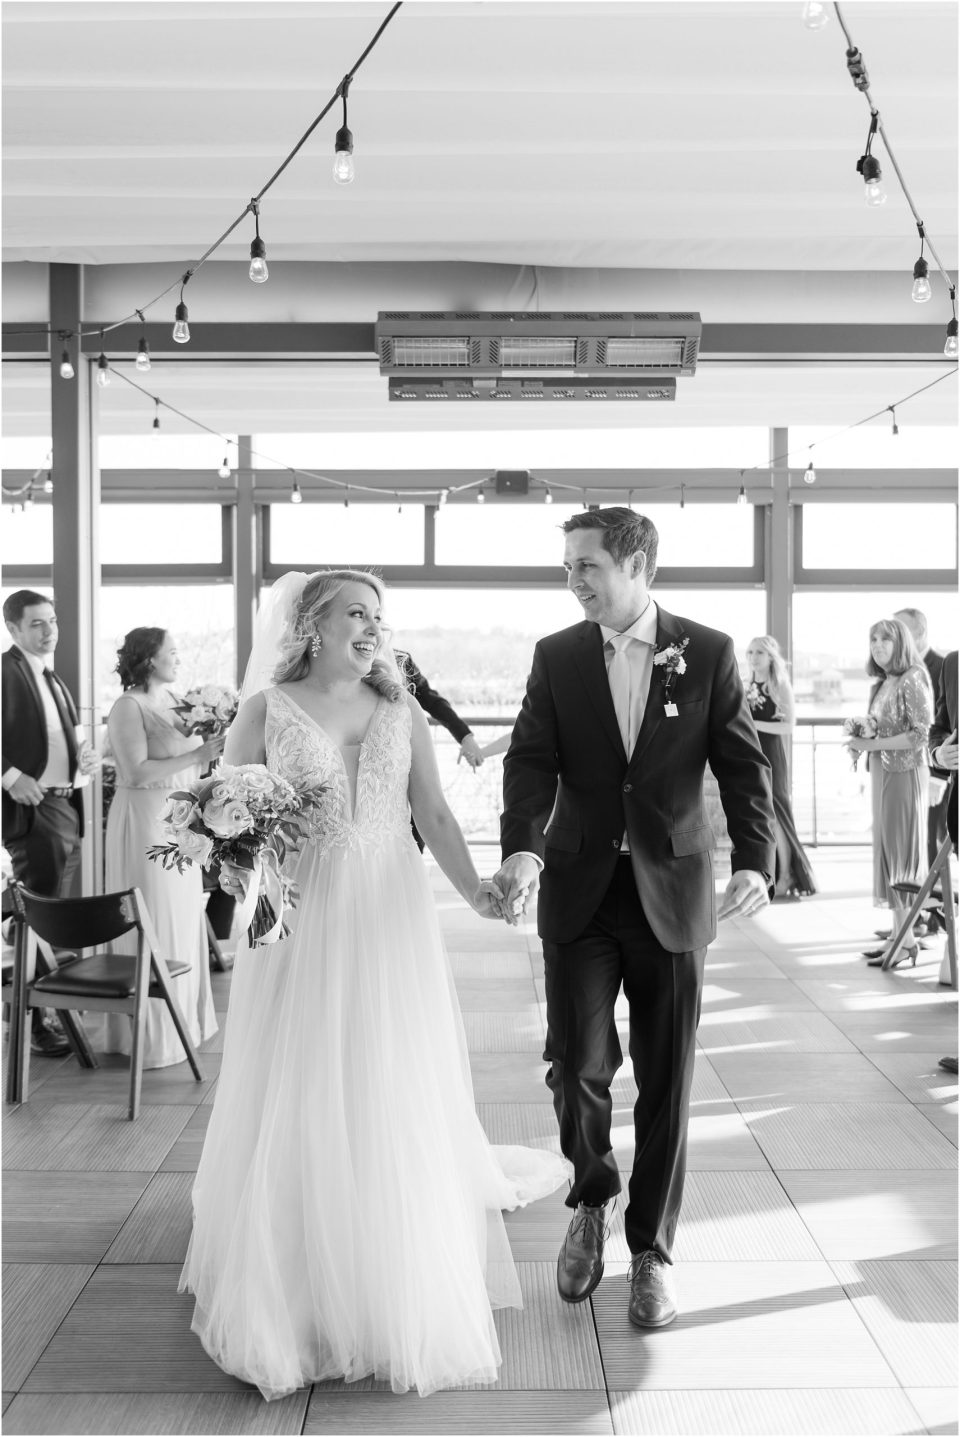 district winery wedding ceremony photo